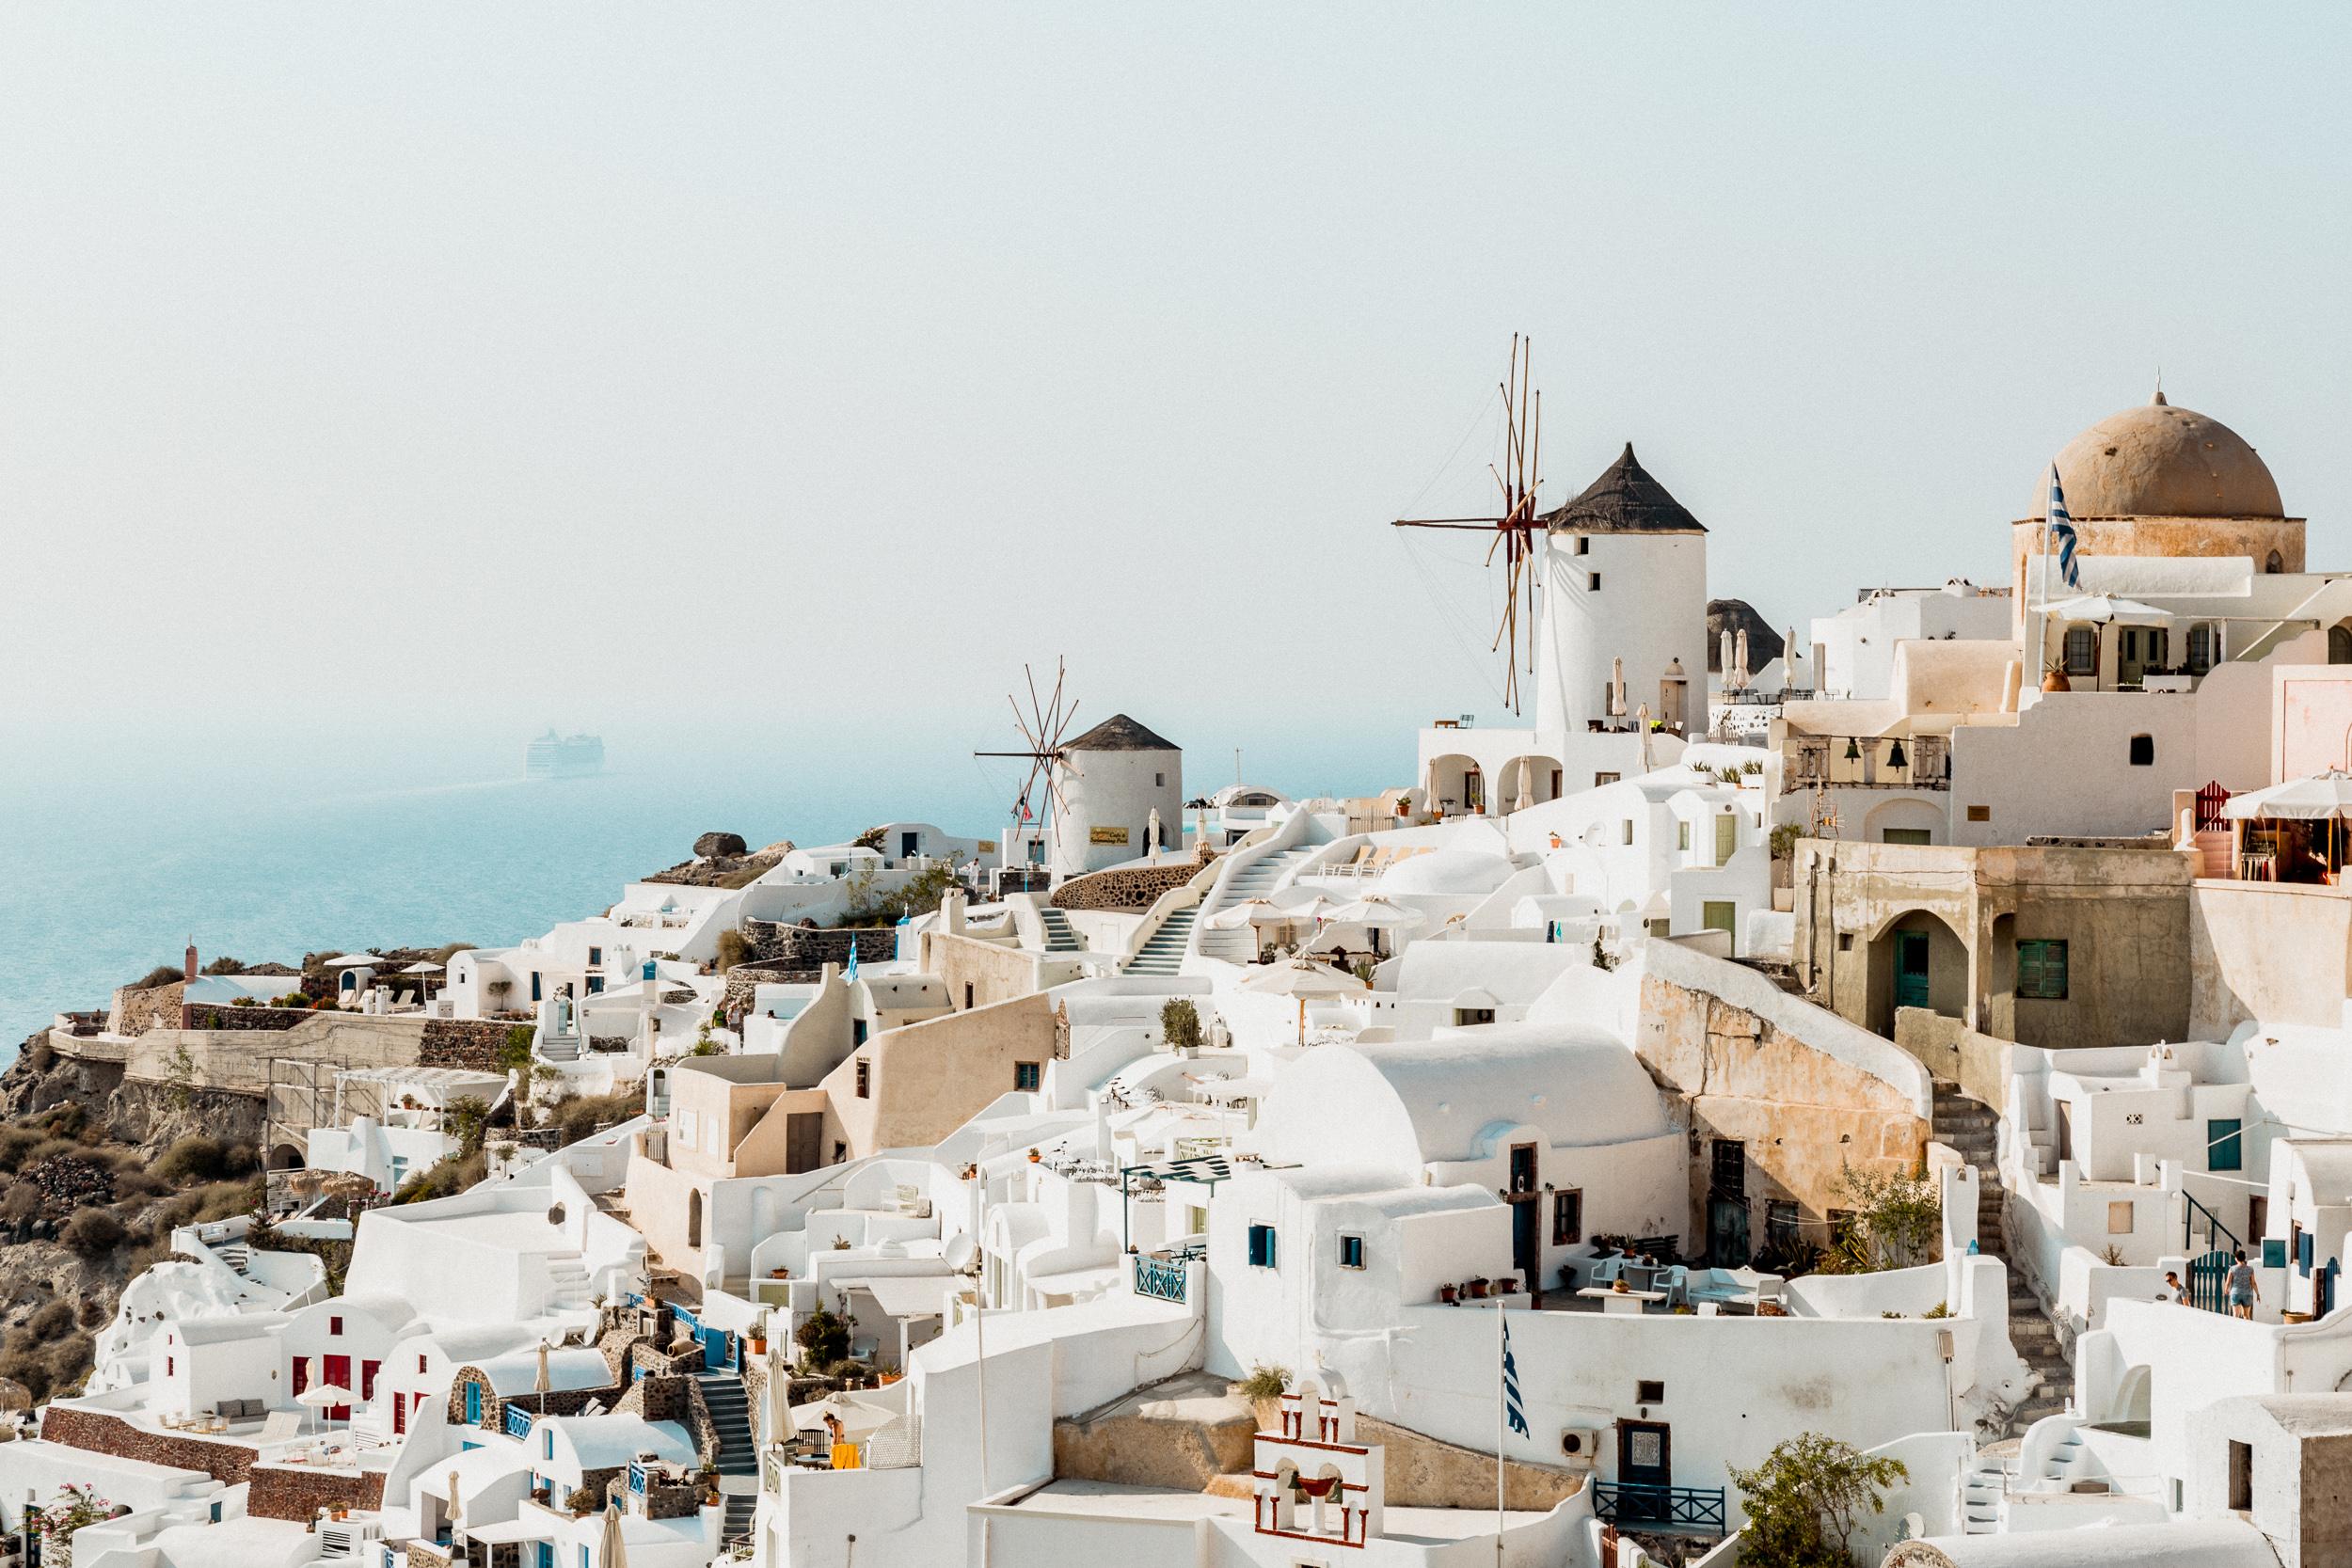 01-santorini-oia-ia-greece-cyclades-travel-anna-elina-lahti-photographer.jpg